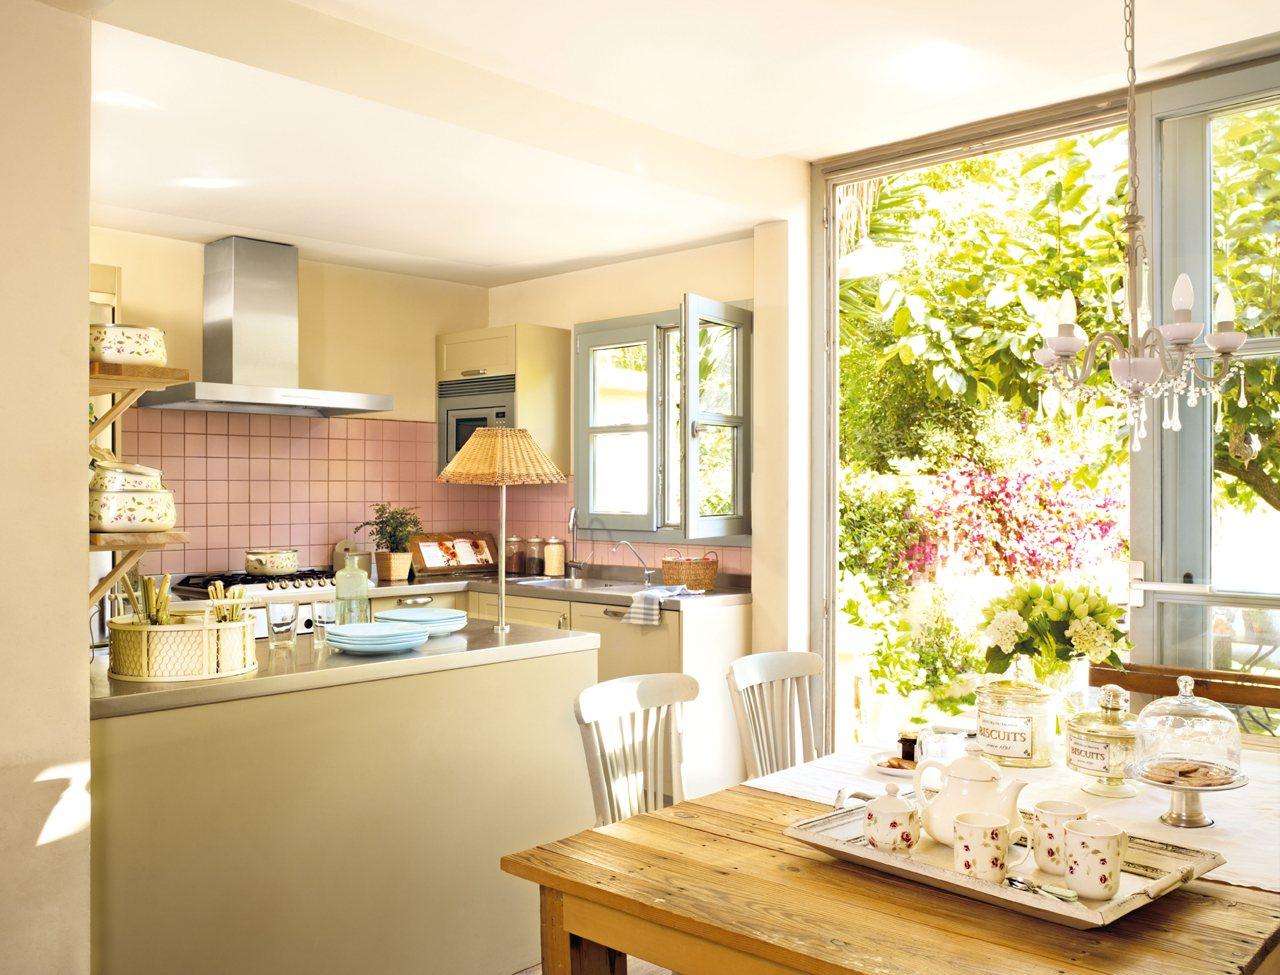 Sala Comedor Cocina Pequeños : Ideas para espacios pequeños